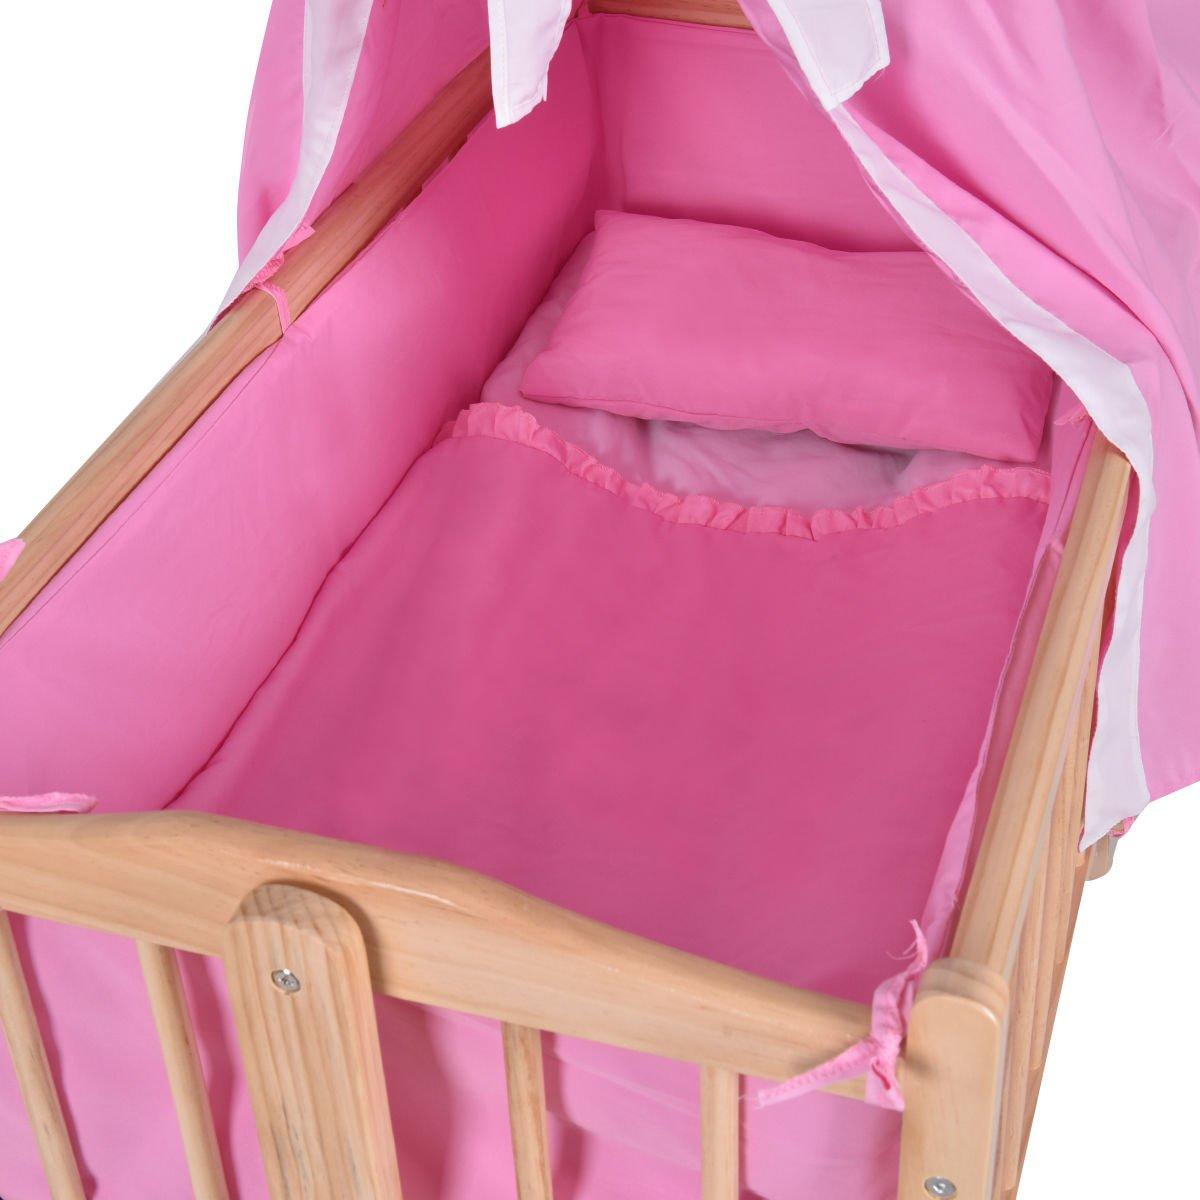 Wood Baby Cradle Rocking Crib Newborn Bassinet Bed Sleeper Portable Nursery Pink by onestops8 (Image #3)